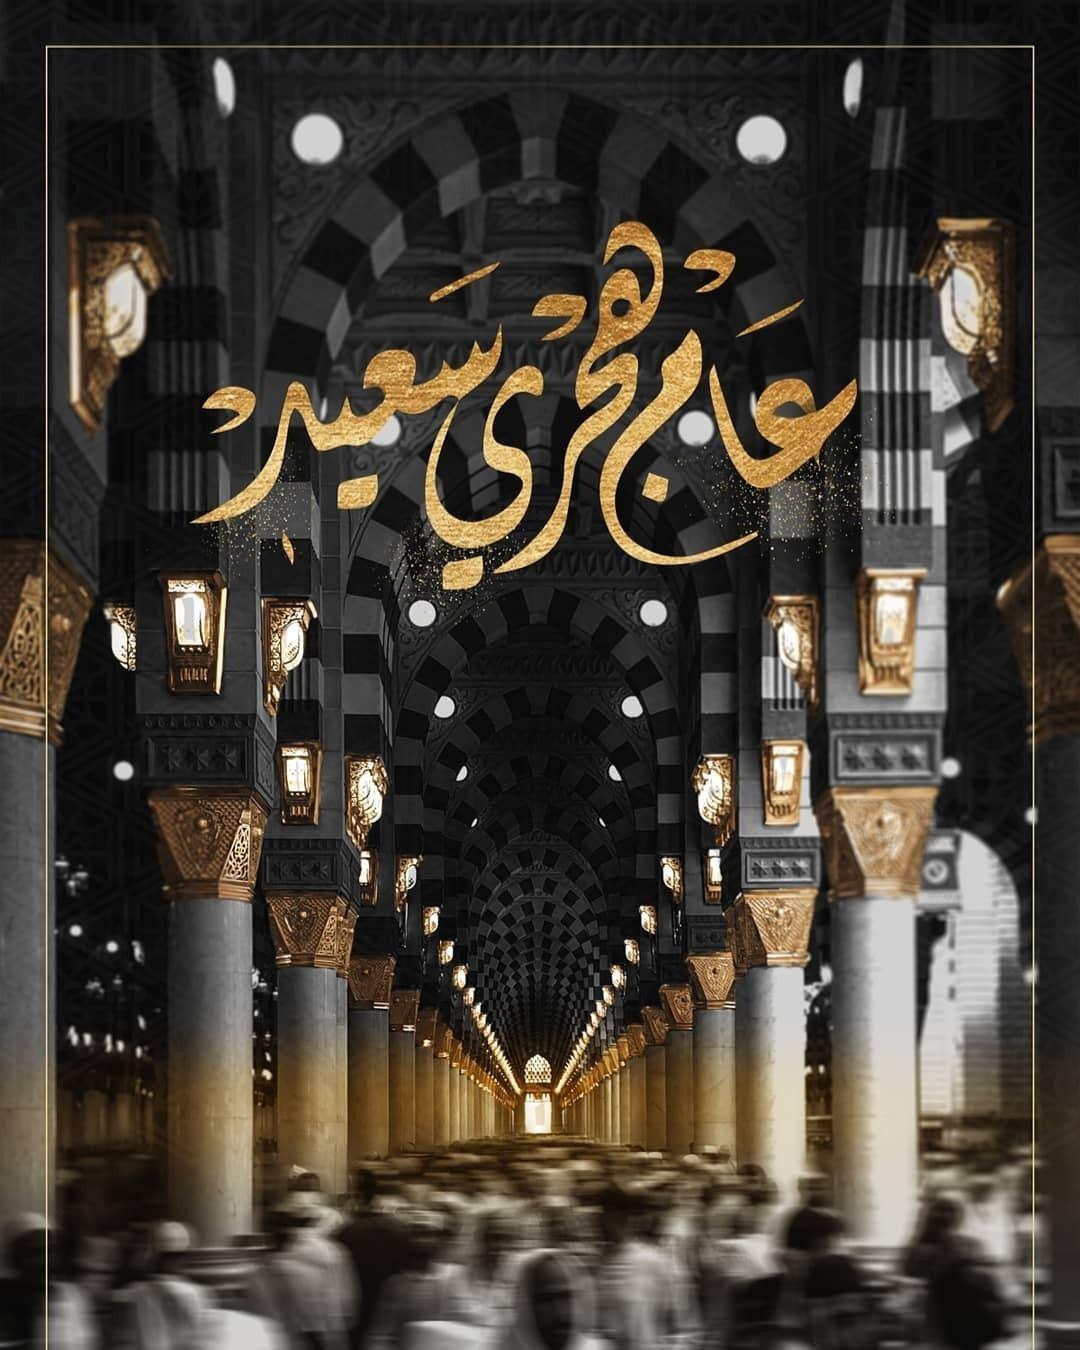 Pin By Ayat Murad On رأس السنة الهجرية ميلادية New Year In 2020 Islamic Pictures Pictures Islam